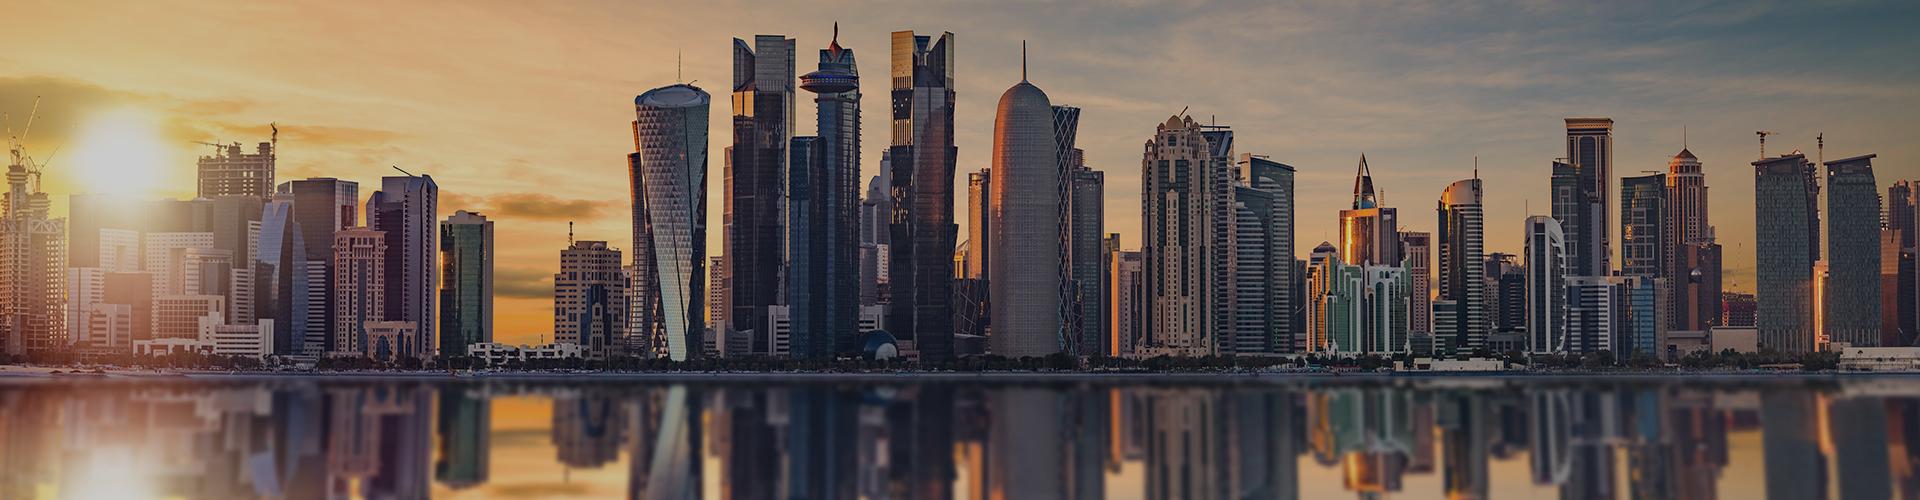 Landmark photograph of Qatar